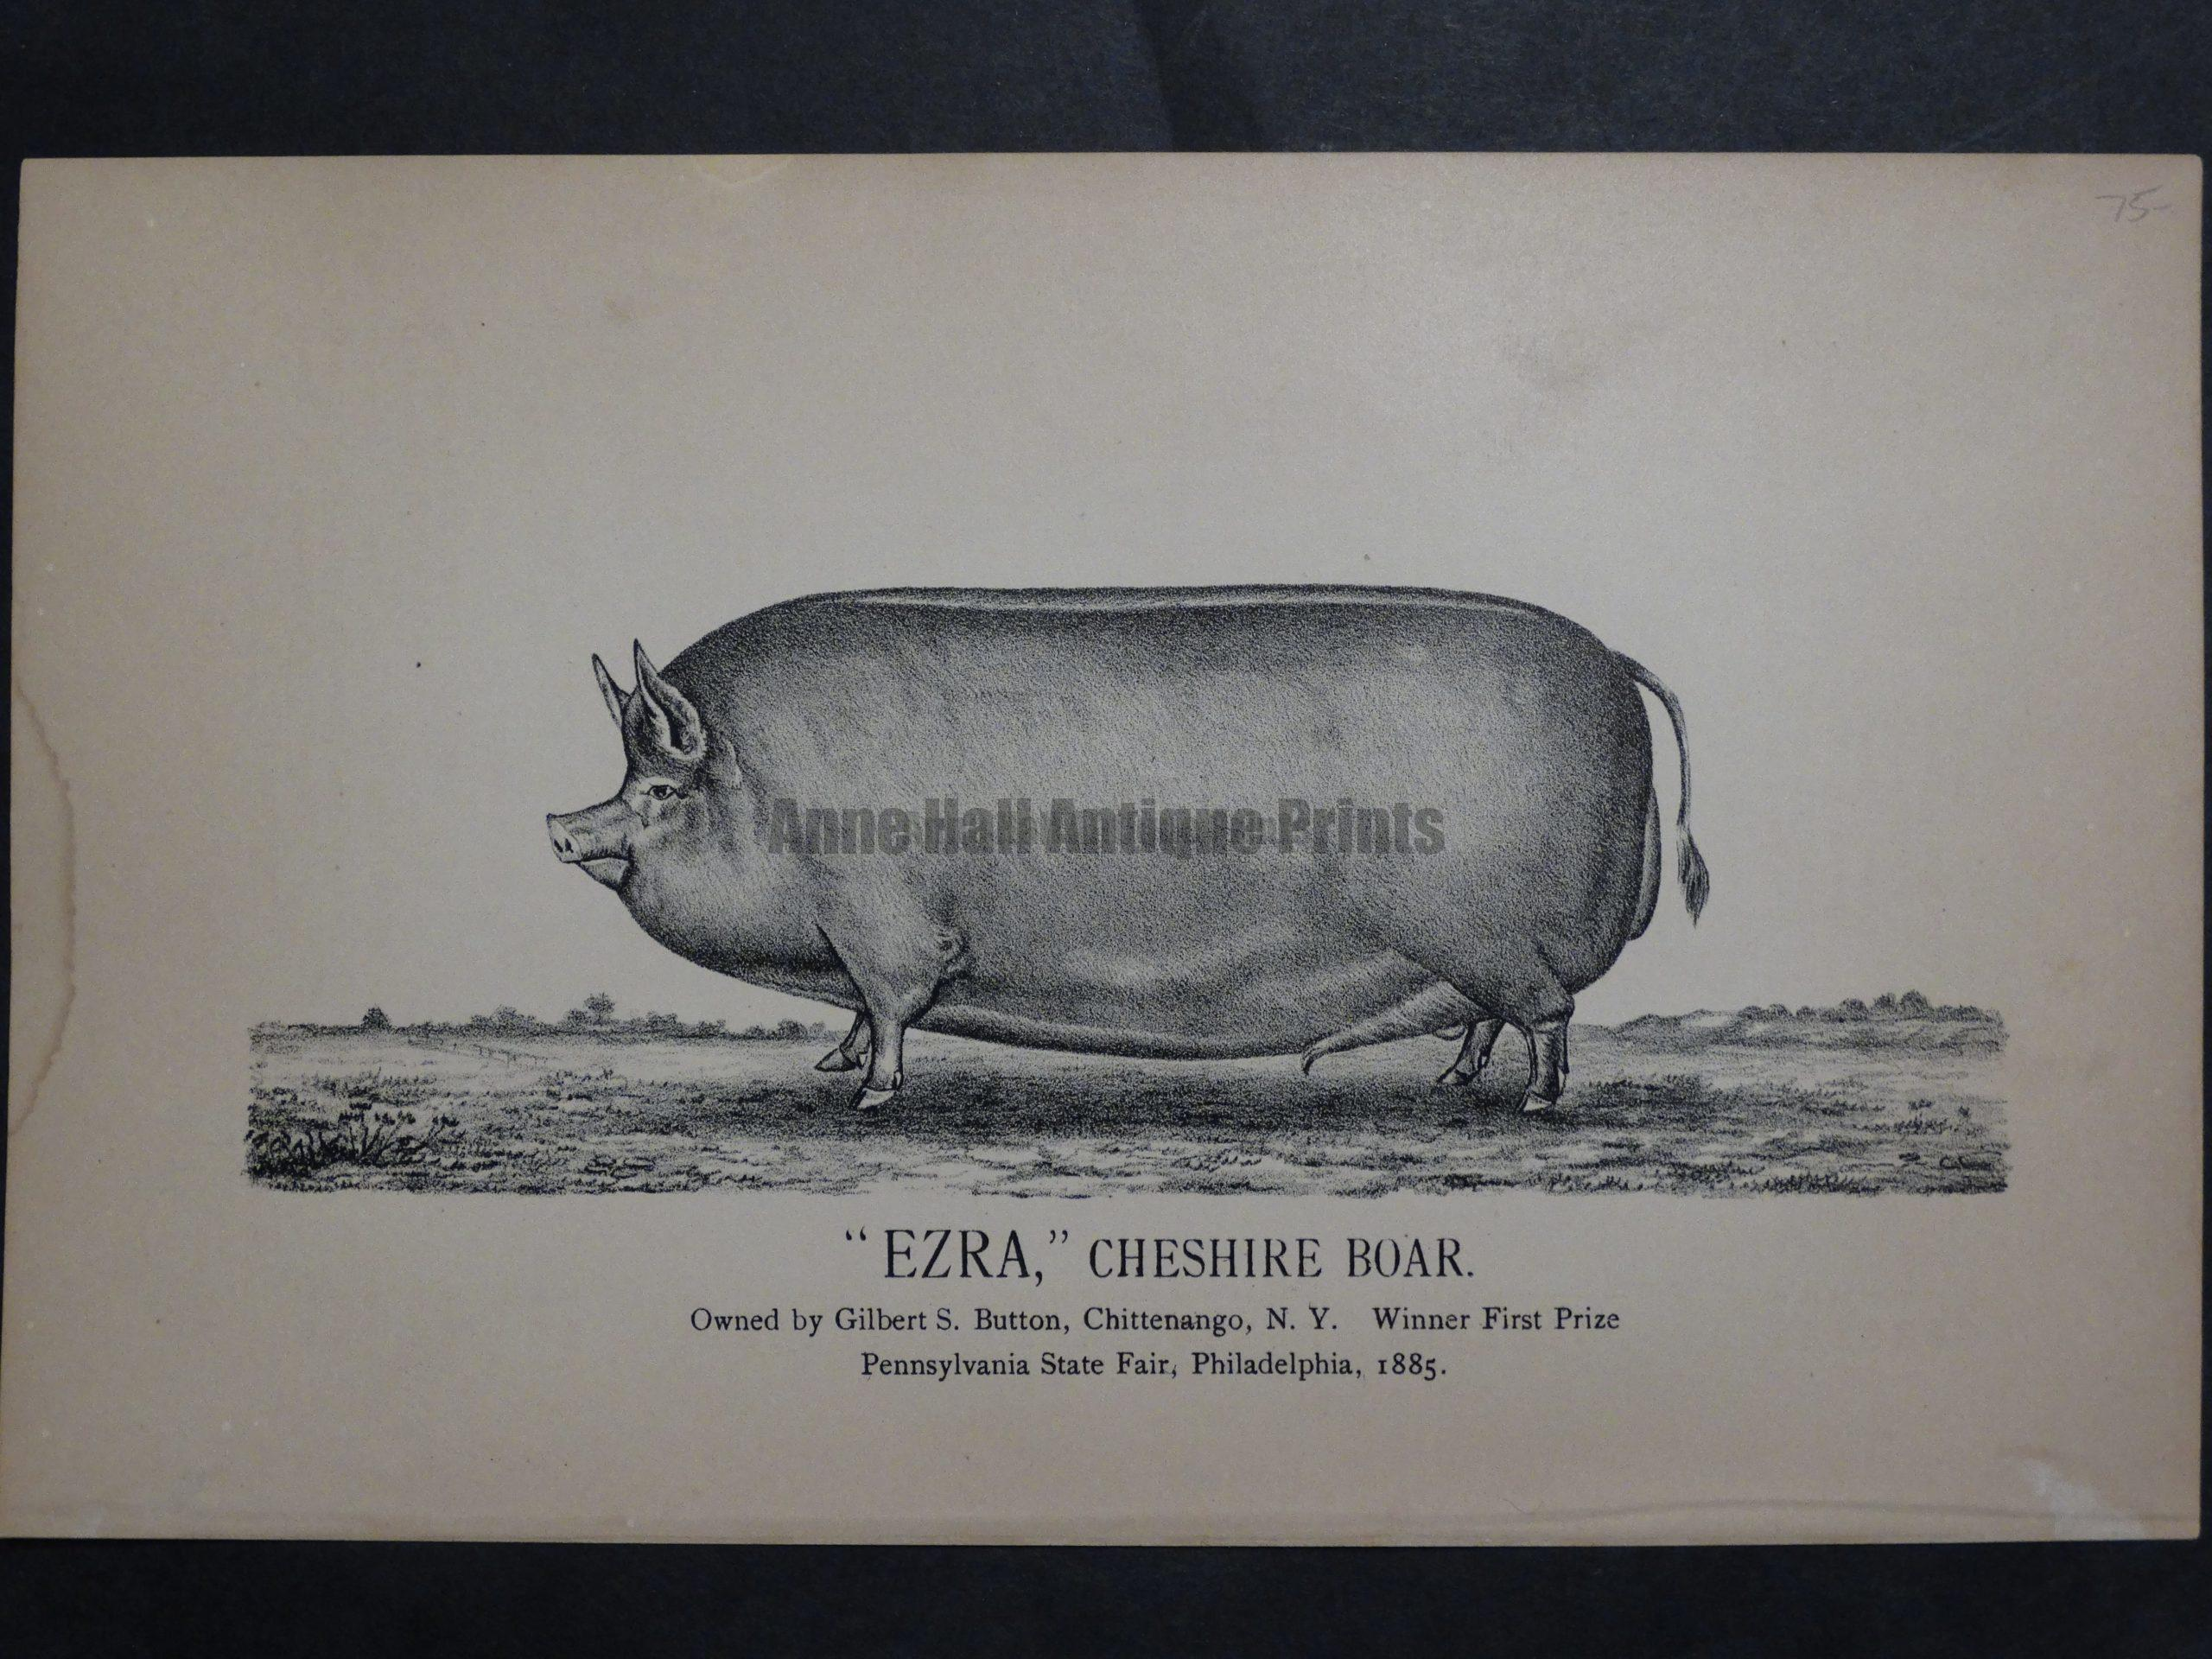 Ezra, Cheshire Boar, c.1885. $75.